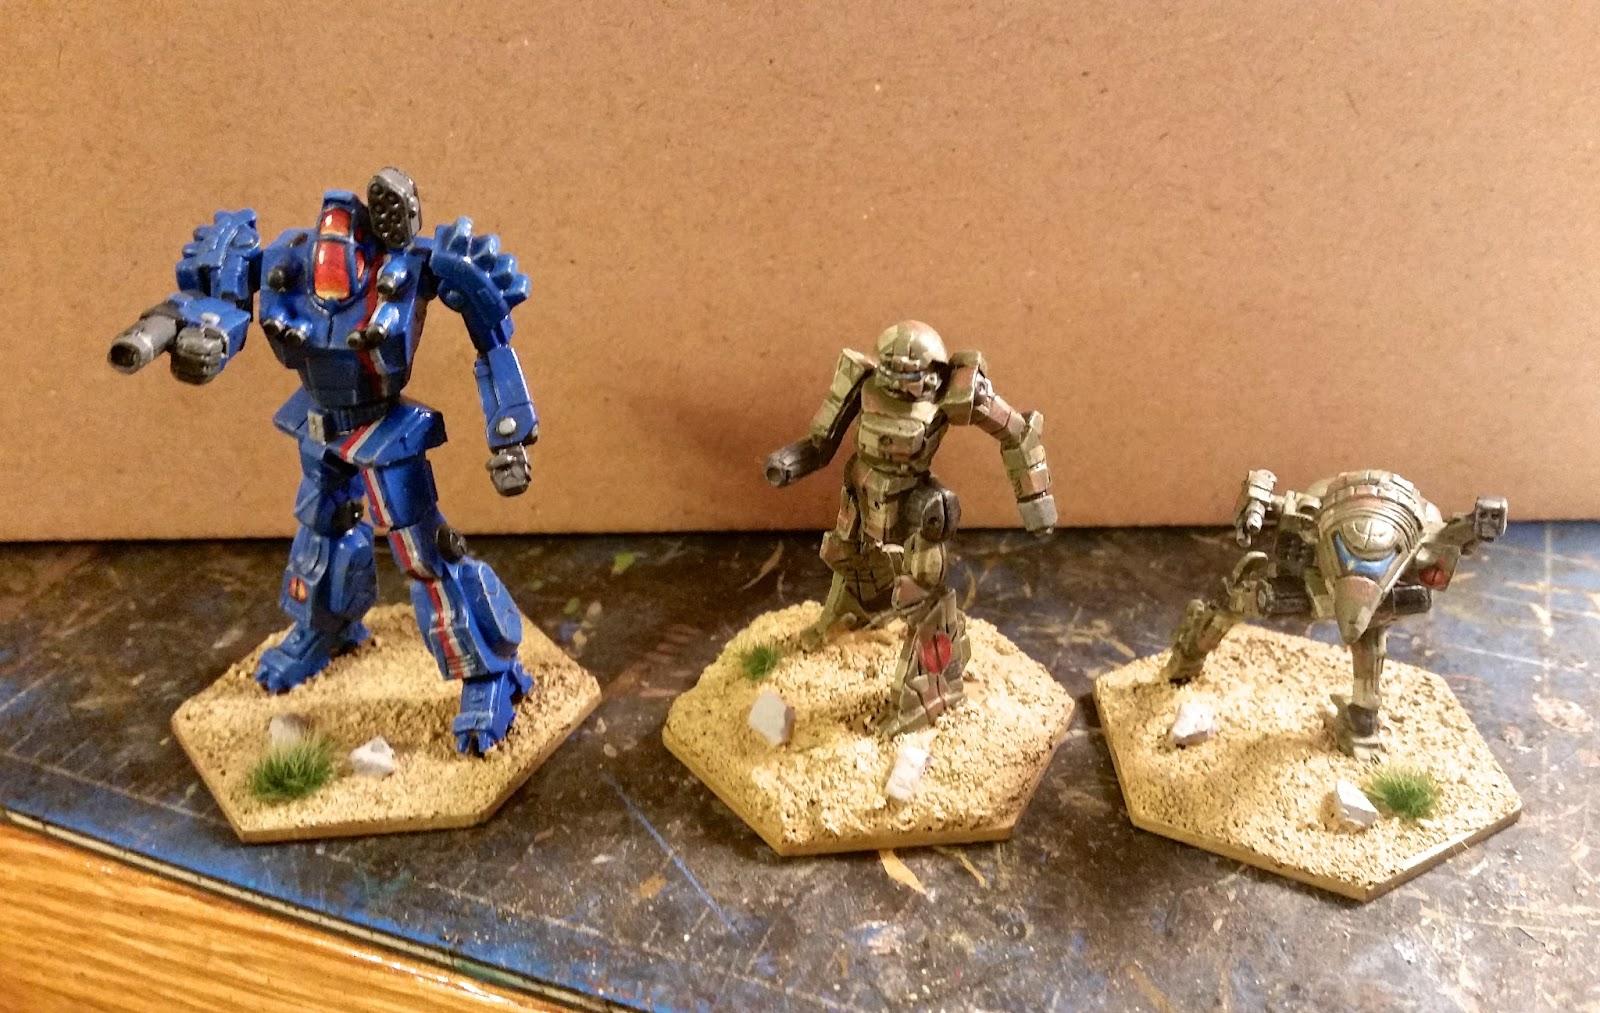 Acrylic Paint For Plastic Miniatures